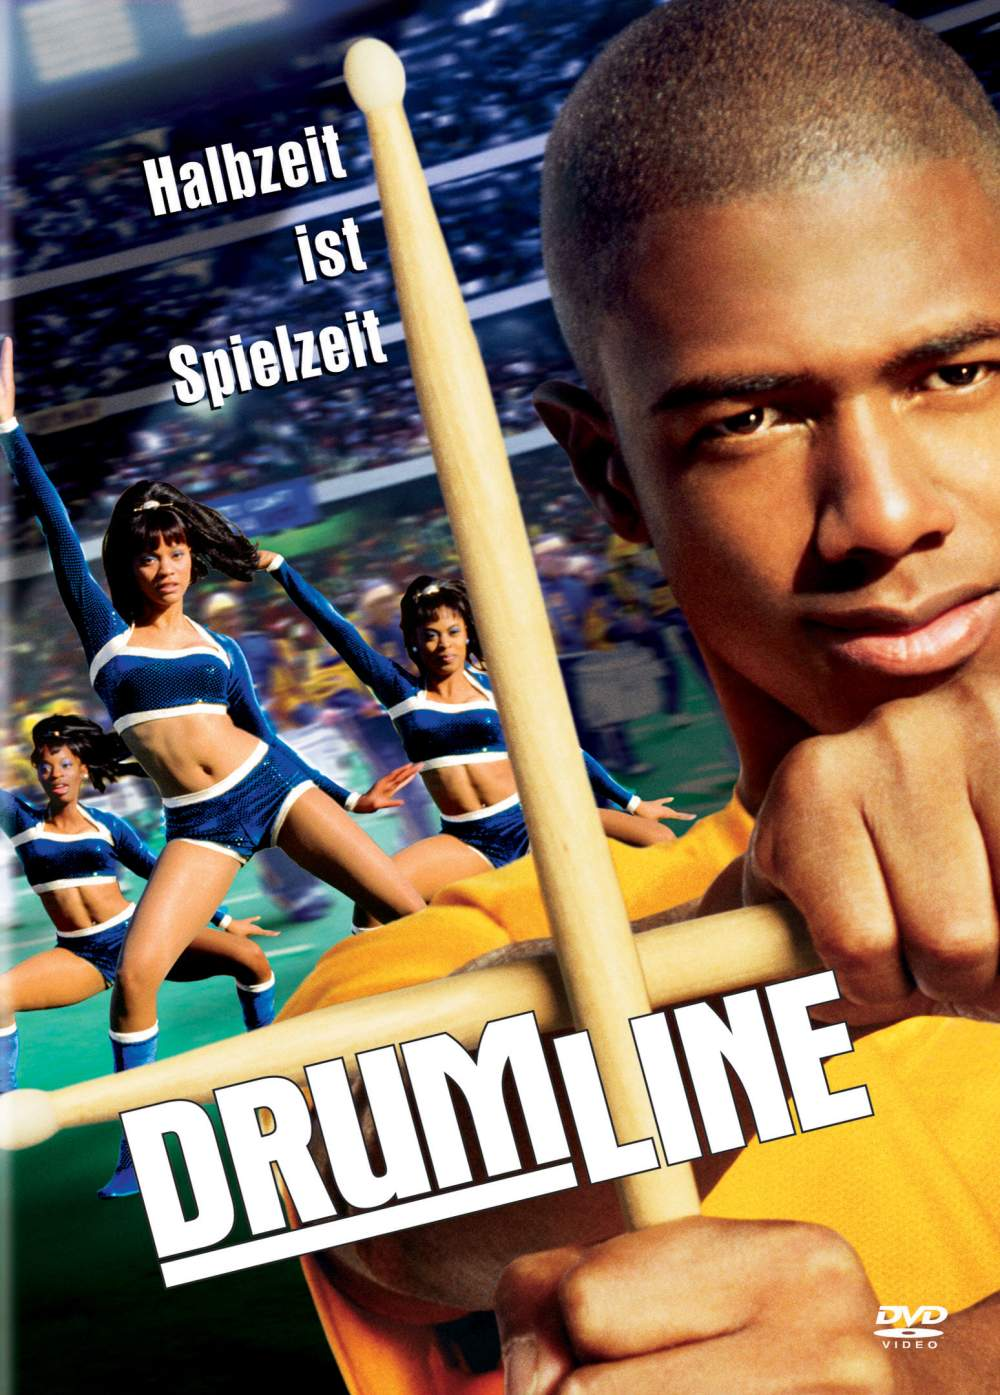 Movie review of drumline